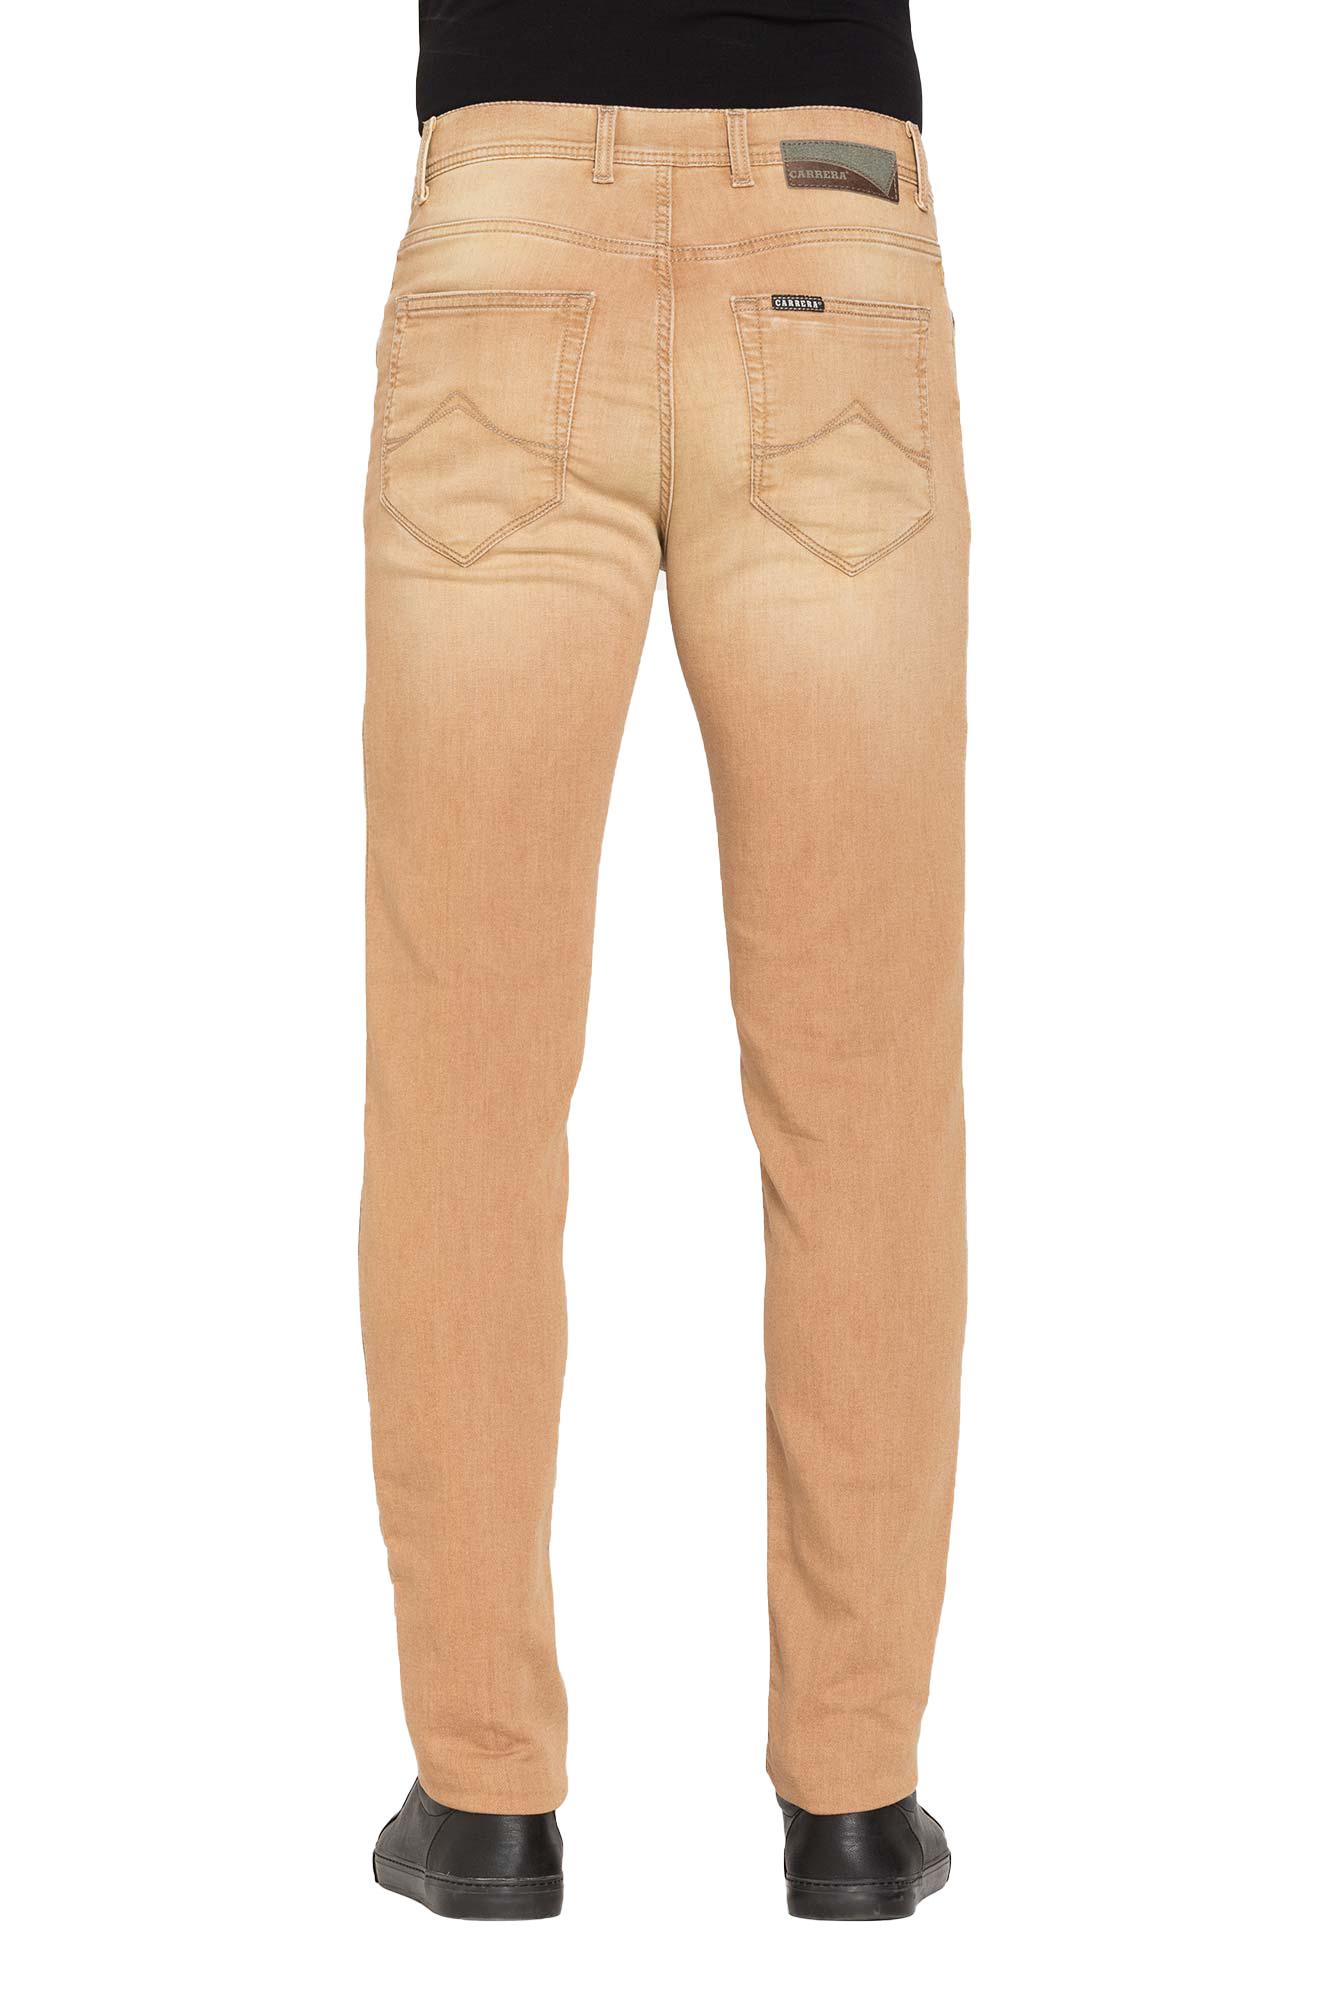 Carrera-Jeans-Jeans-per-uomo-tinta-unita miniatura 4